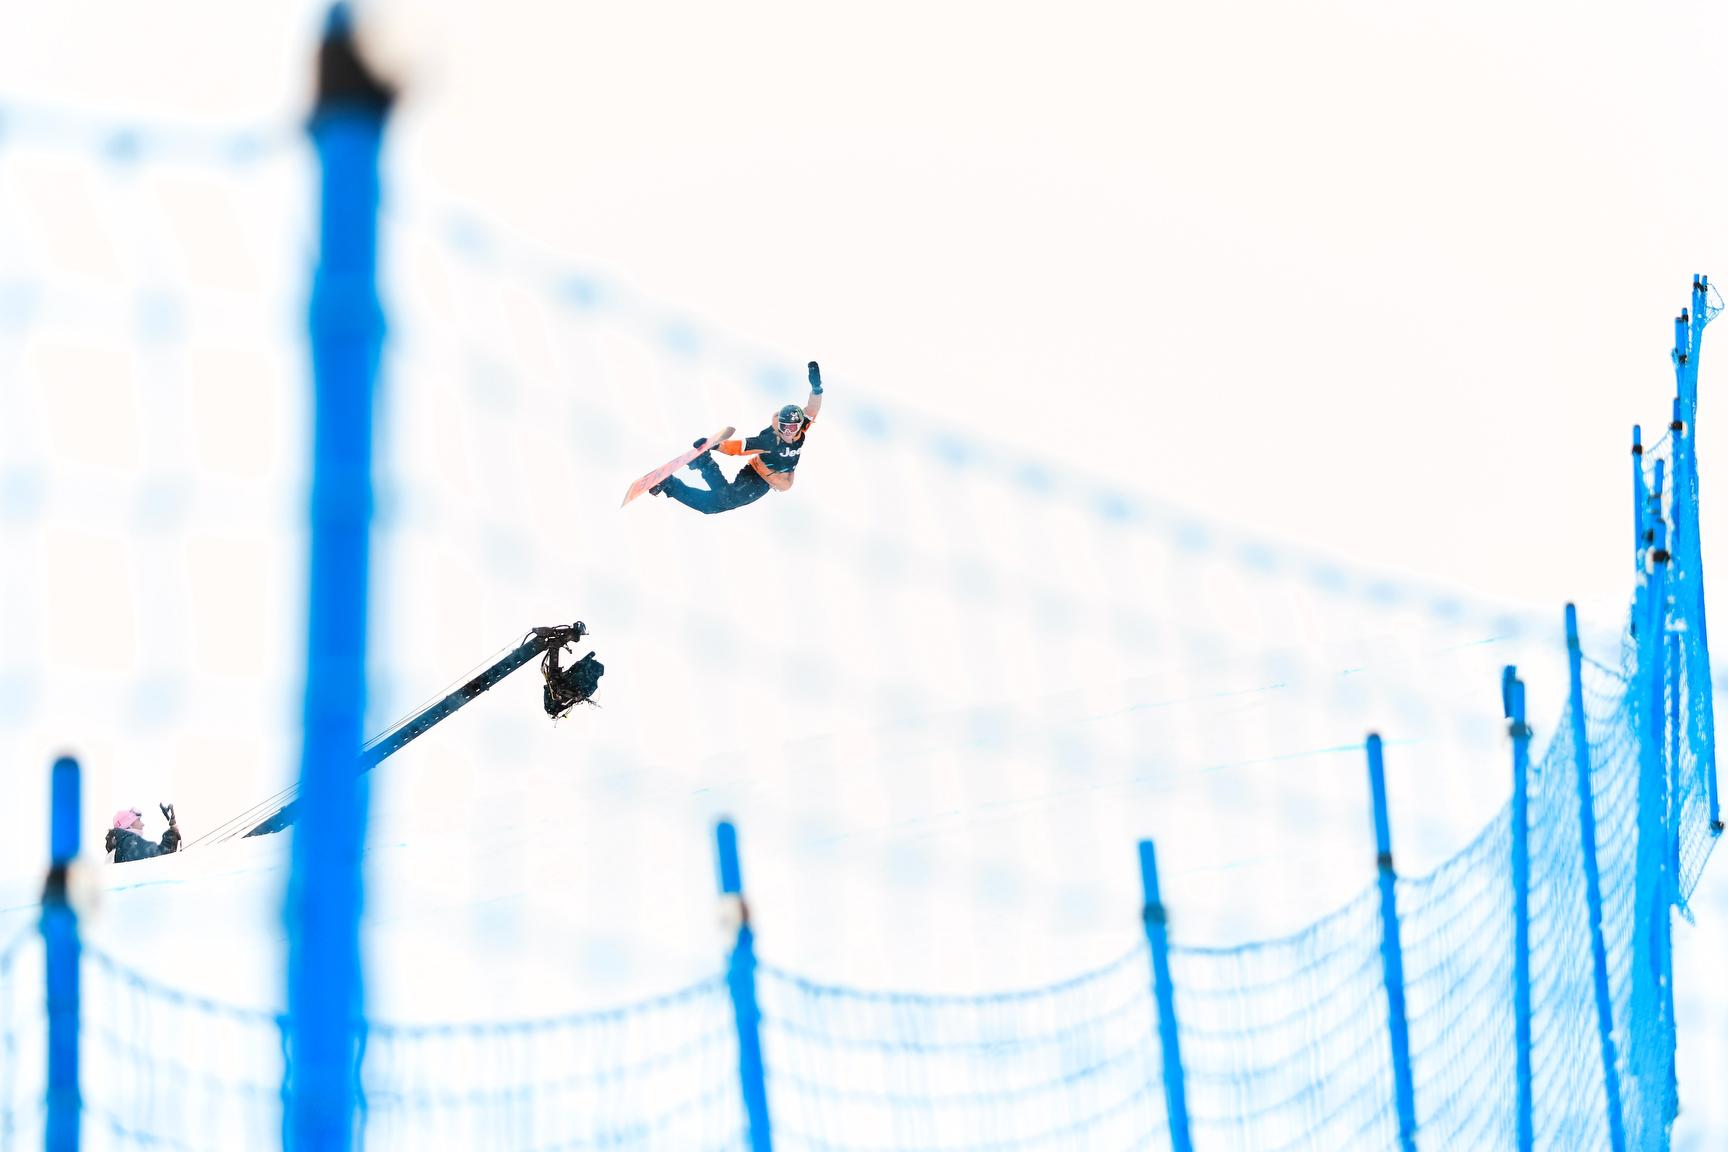 Stäle Sandbech, M Snowboard Slopestyle Elims